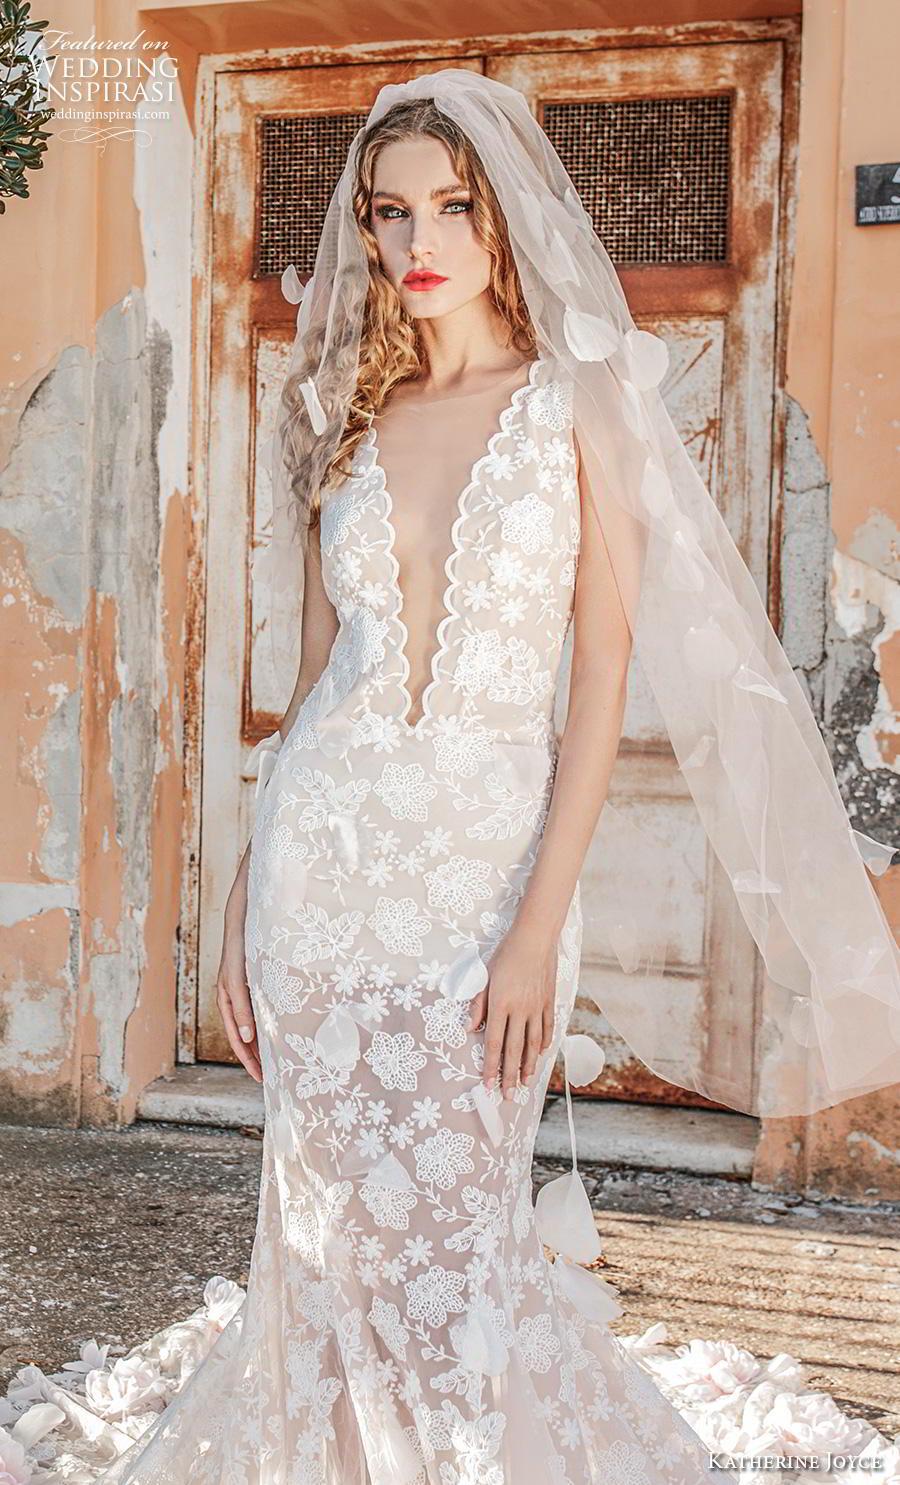 katherine joyce 2019 bridal sleeveless illusion boat deep v neck full embellishment romantic fit and flare trumpet wedding dress low open back backless chapel train (1) zv